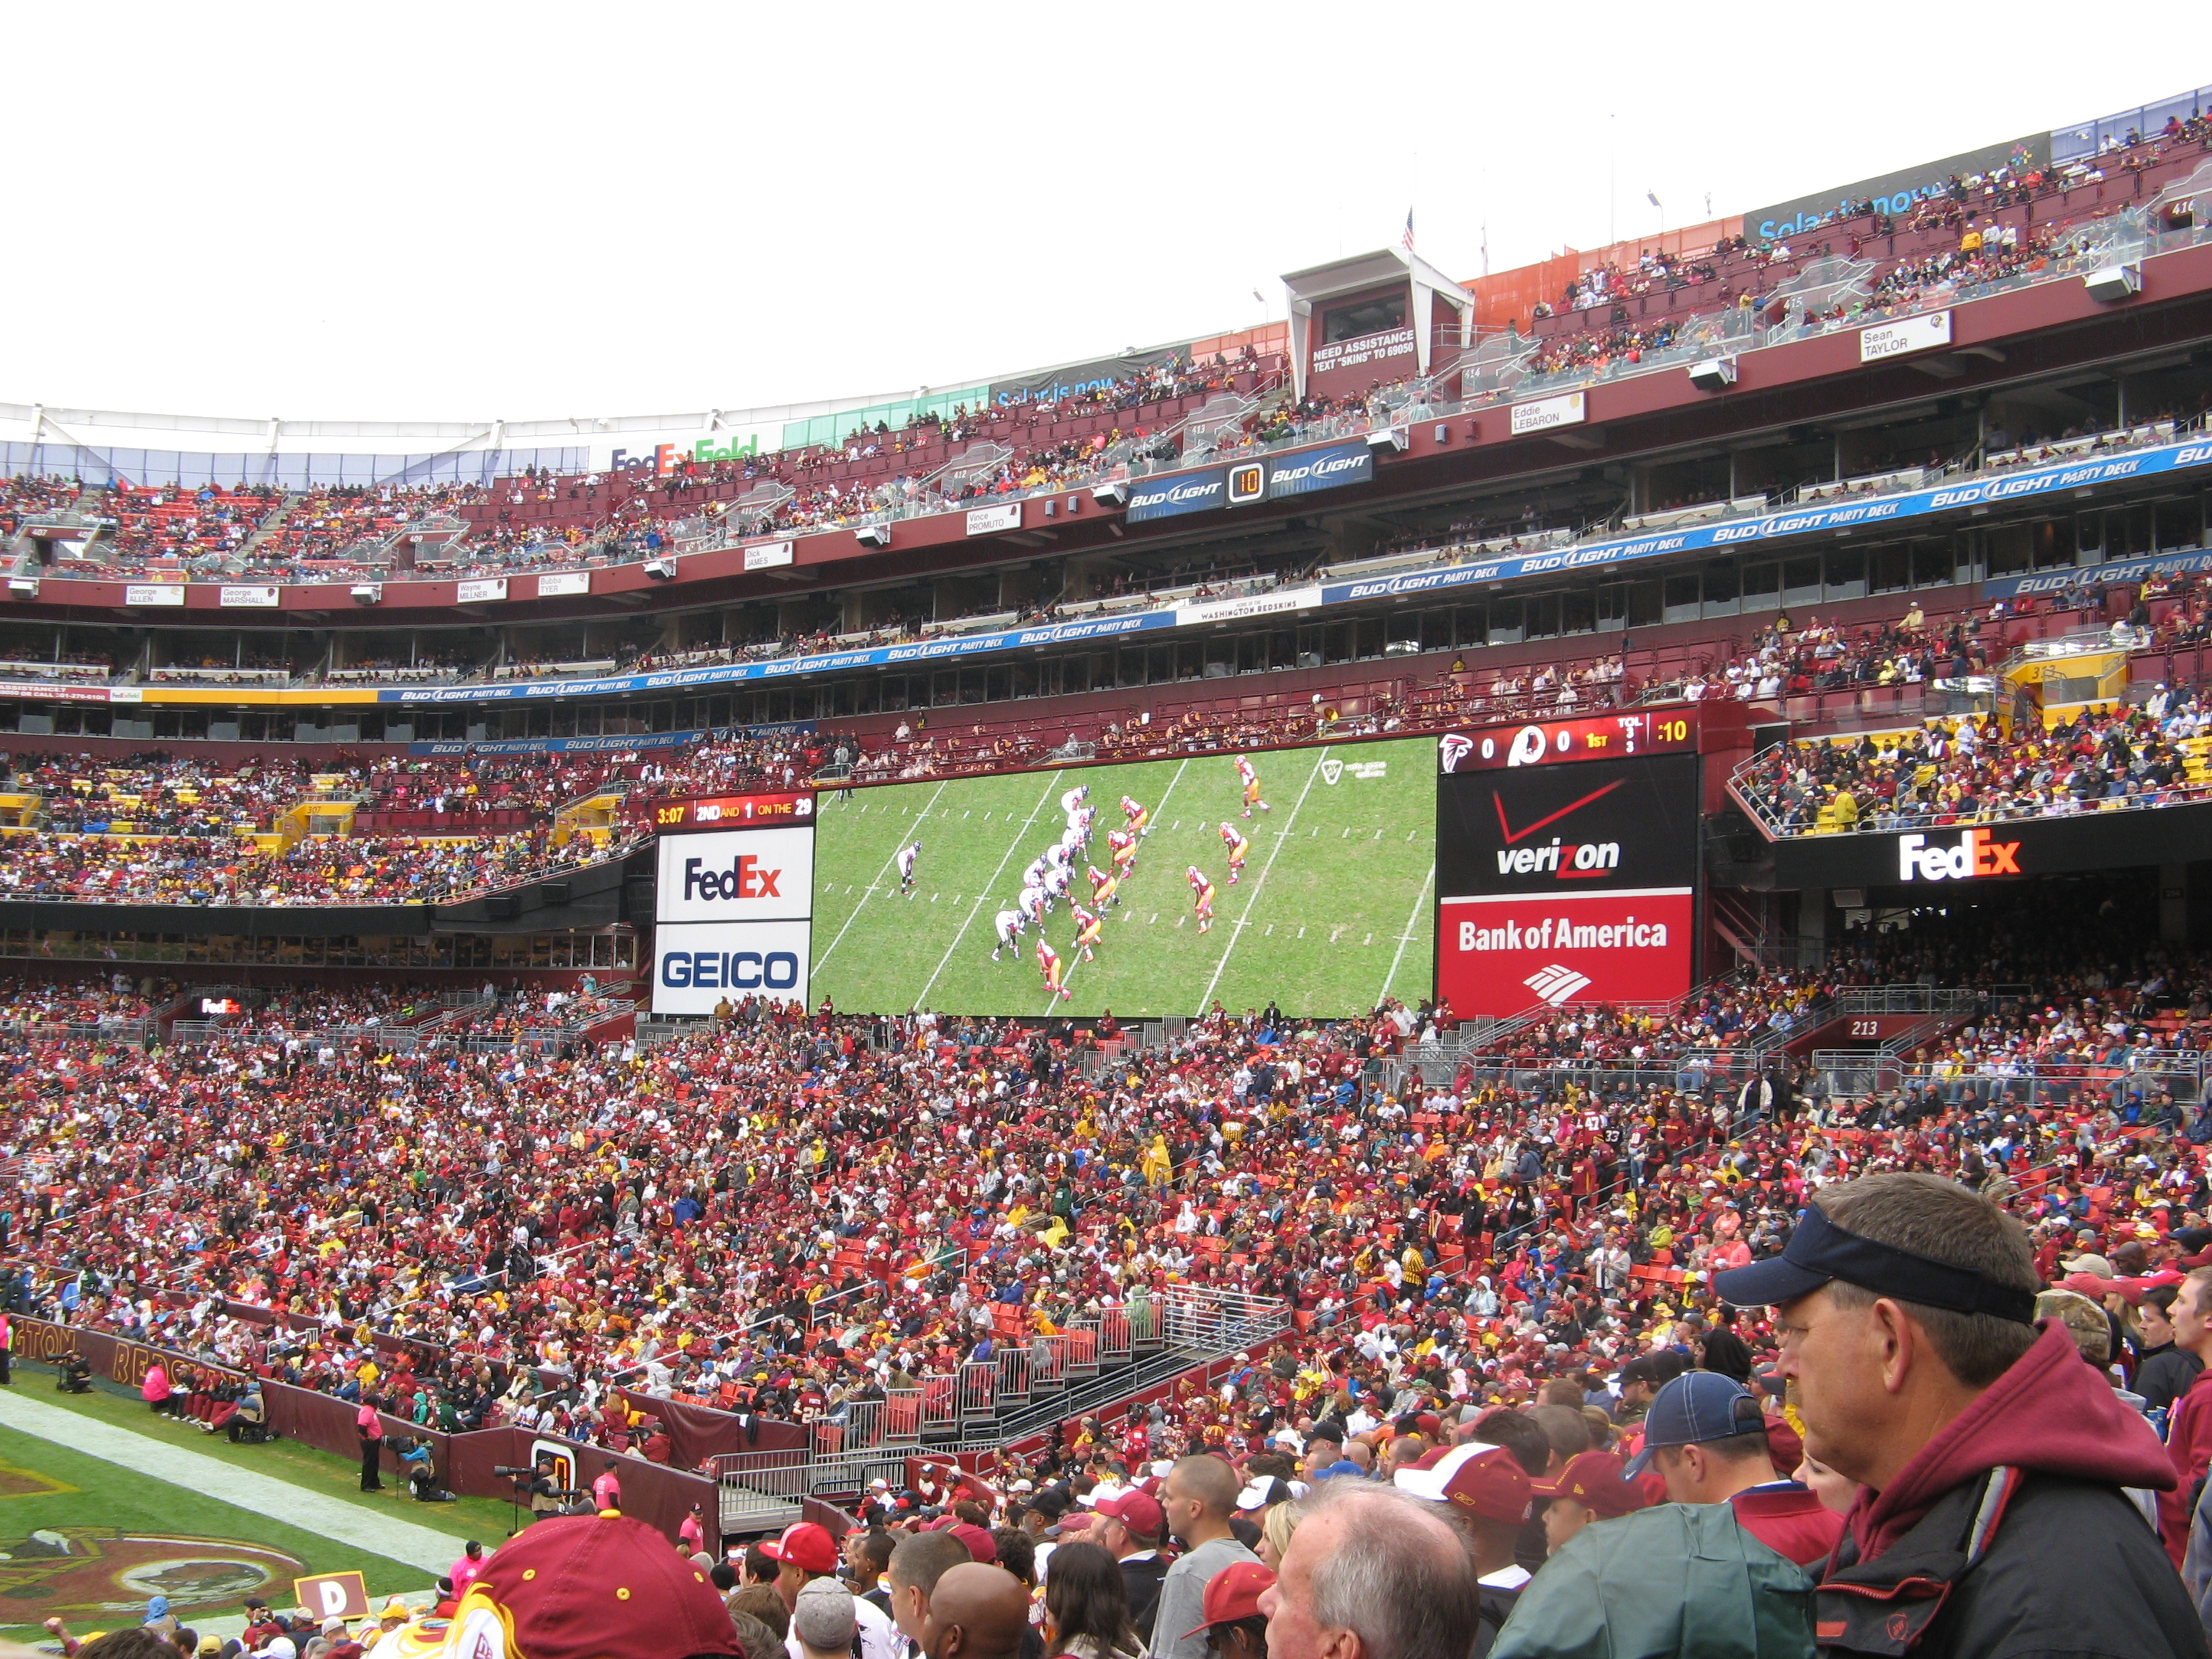 File:Washington Redskins Vs Atlanta Falcons 07.10.2012 FedEx 016.JPG